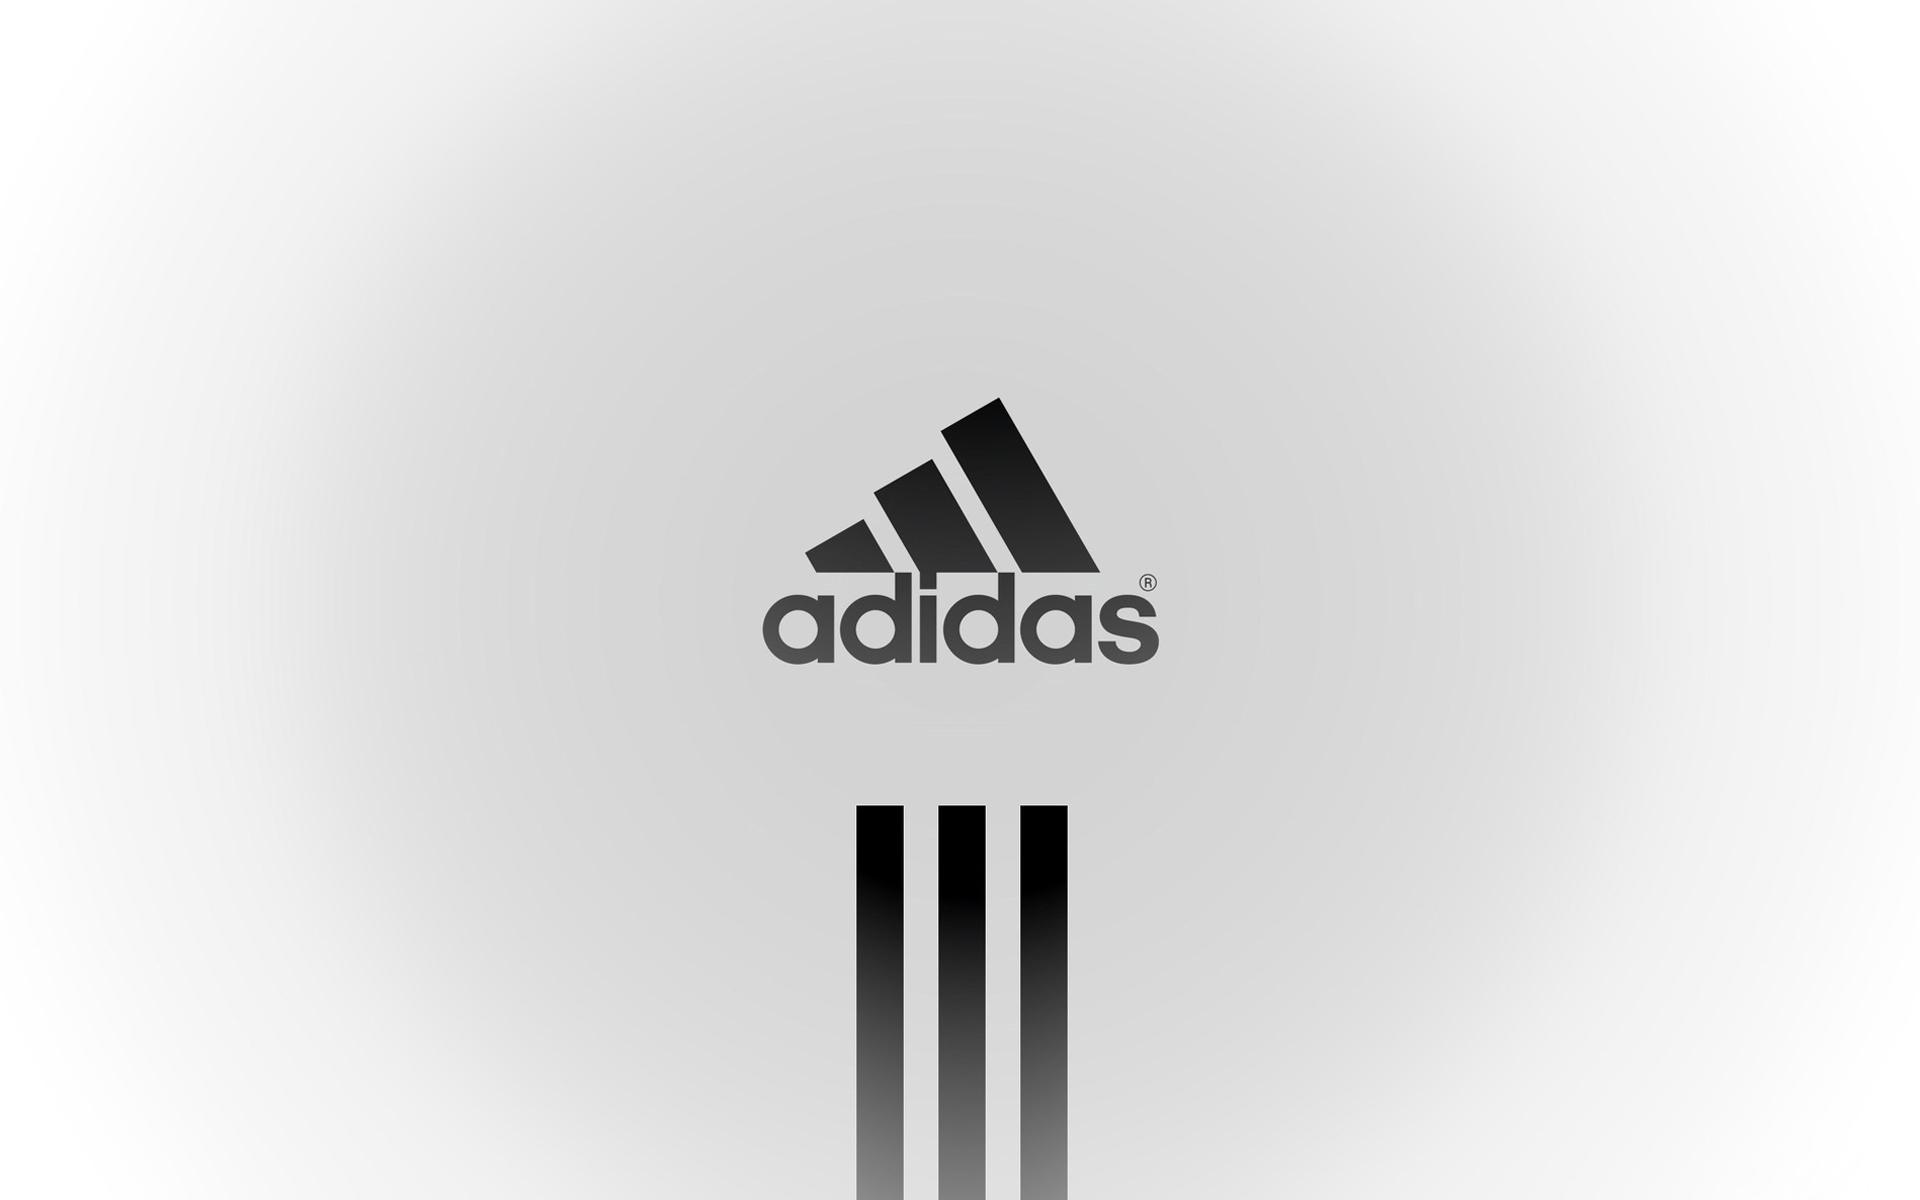 Adidas创意logo桌面壁纸